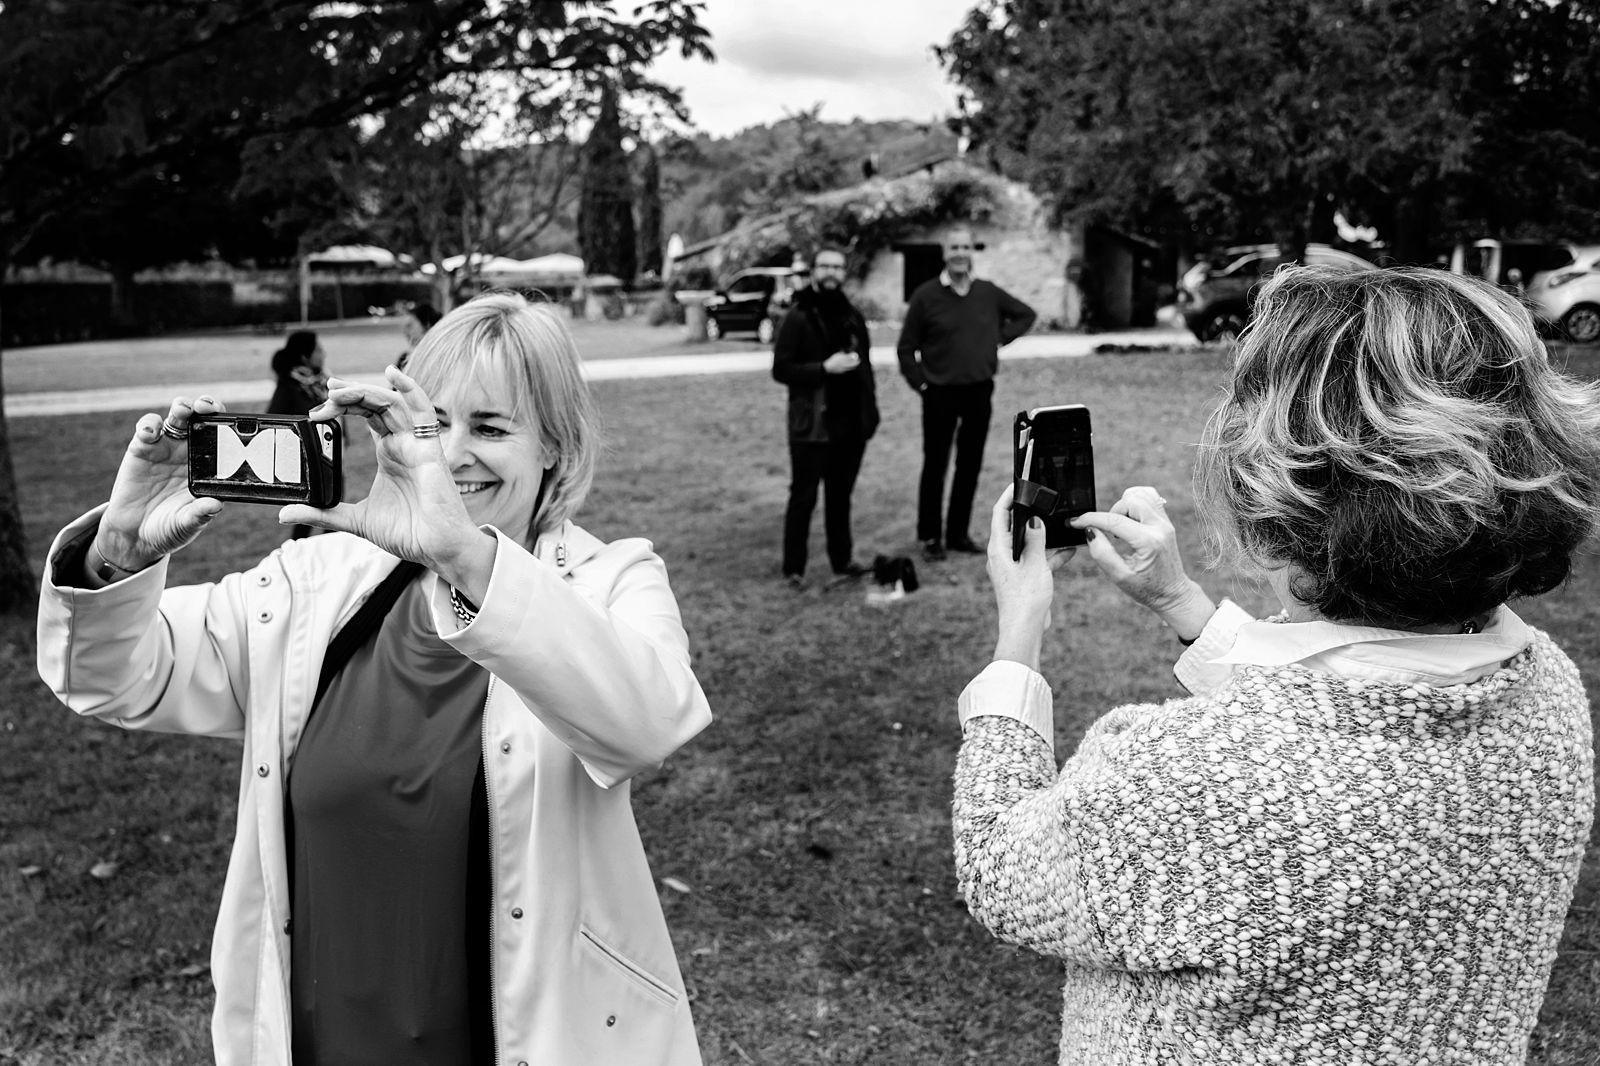 RUUDC Fotografie, fotograaf Ruud, trouwen in Frankrijk, trouwen frankrijk, bruiloft in frankrijk, destination wedding fotograaf, fotograaf bruiloft trouwfotograaf frankrijk, bruidsfotograaf frankrijk, trouwen prayssac, trouwen camp del saltre, bruiloft camp del saltre, lot of happiness, mariage france, mariage praysac, mariage camp del saltre